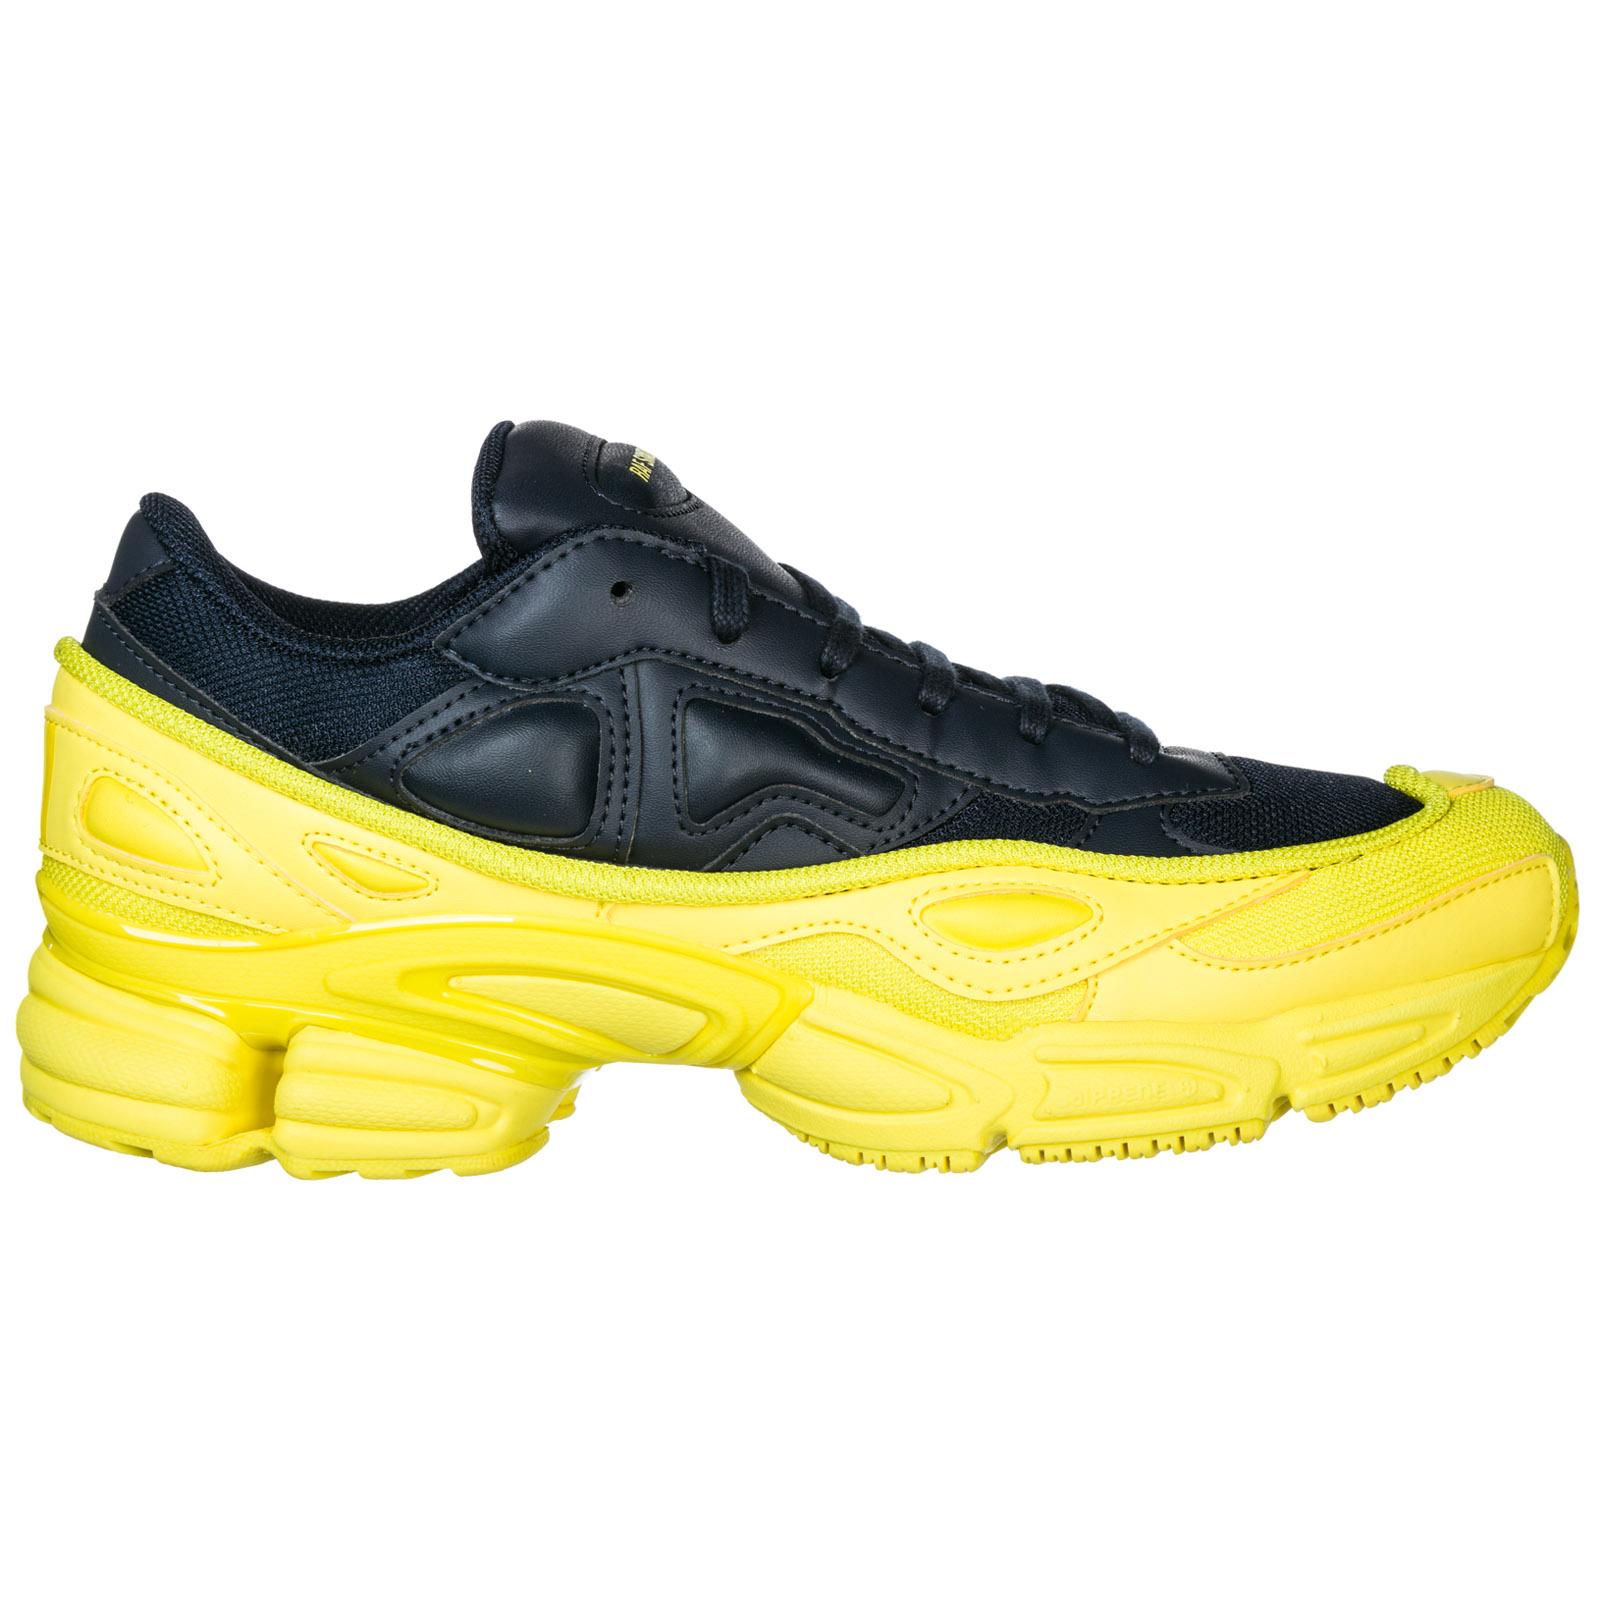 navy F34267 Adidas by ozweego Simons Basket Rs Raf yellow x8HYqwwZg